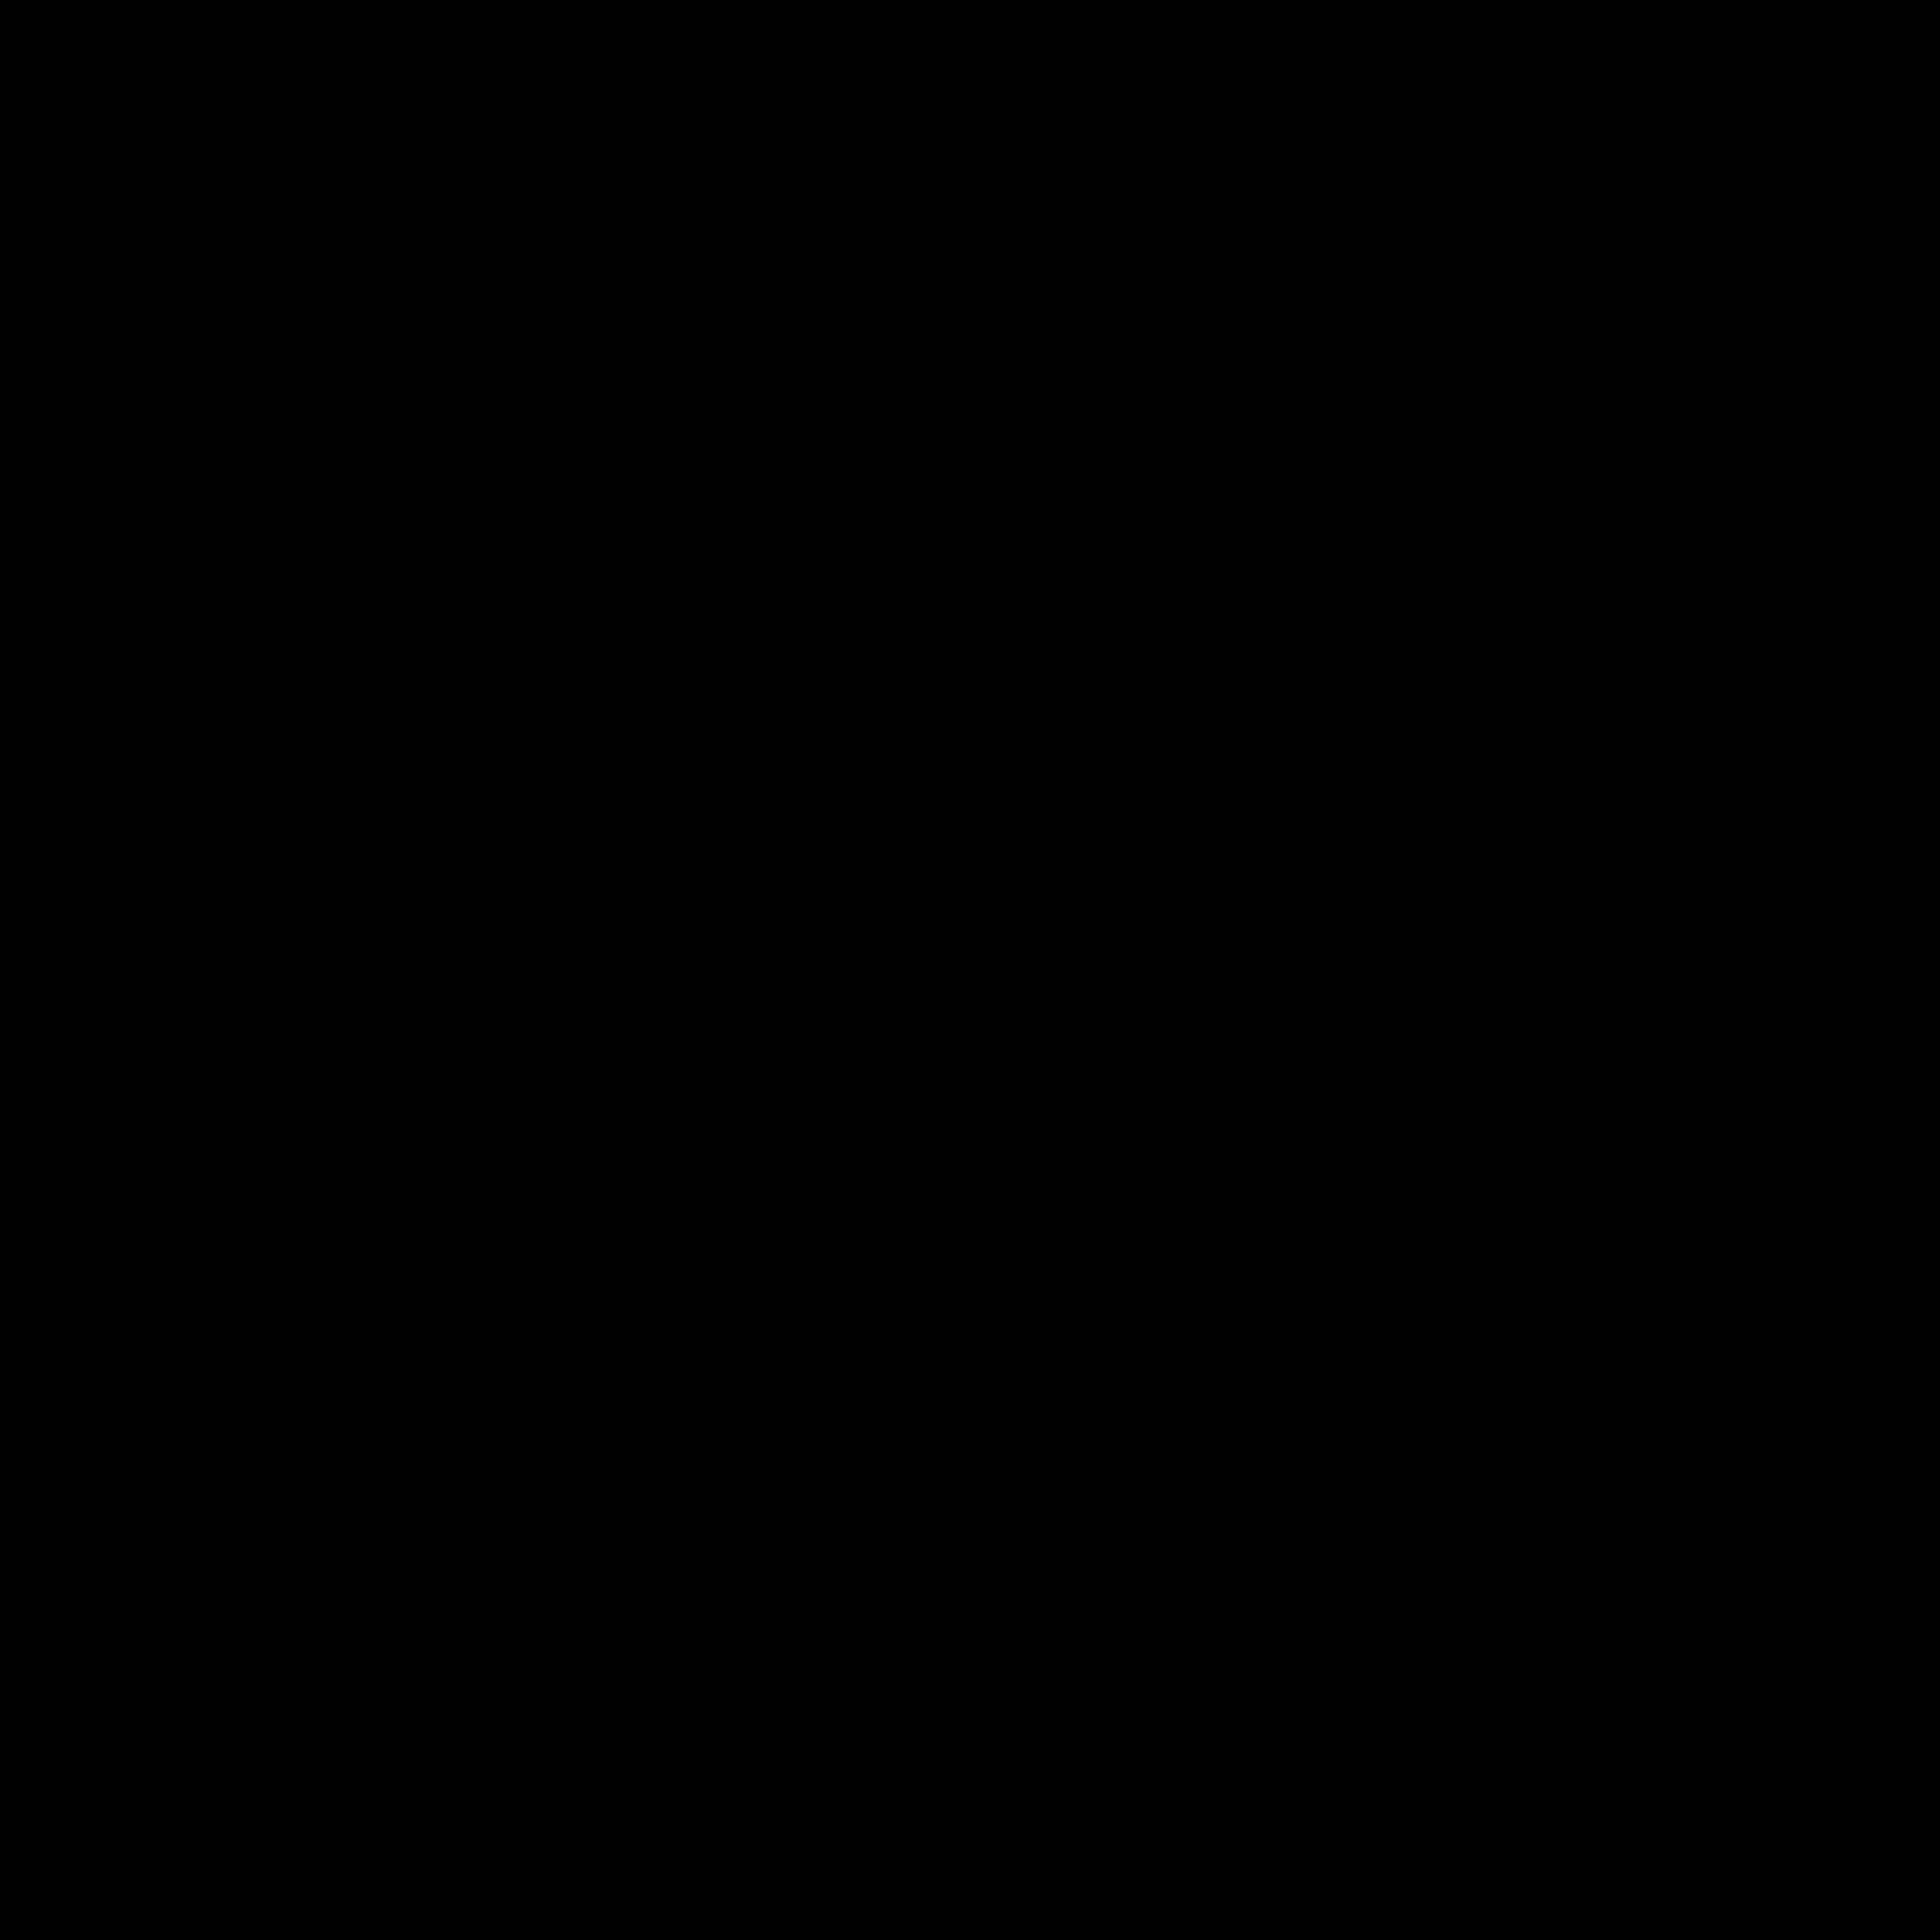 THE MENLOVE